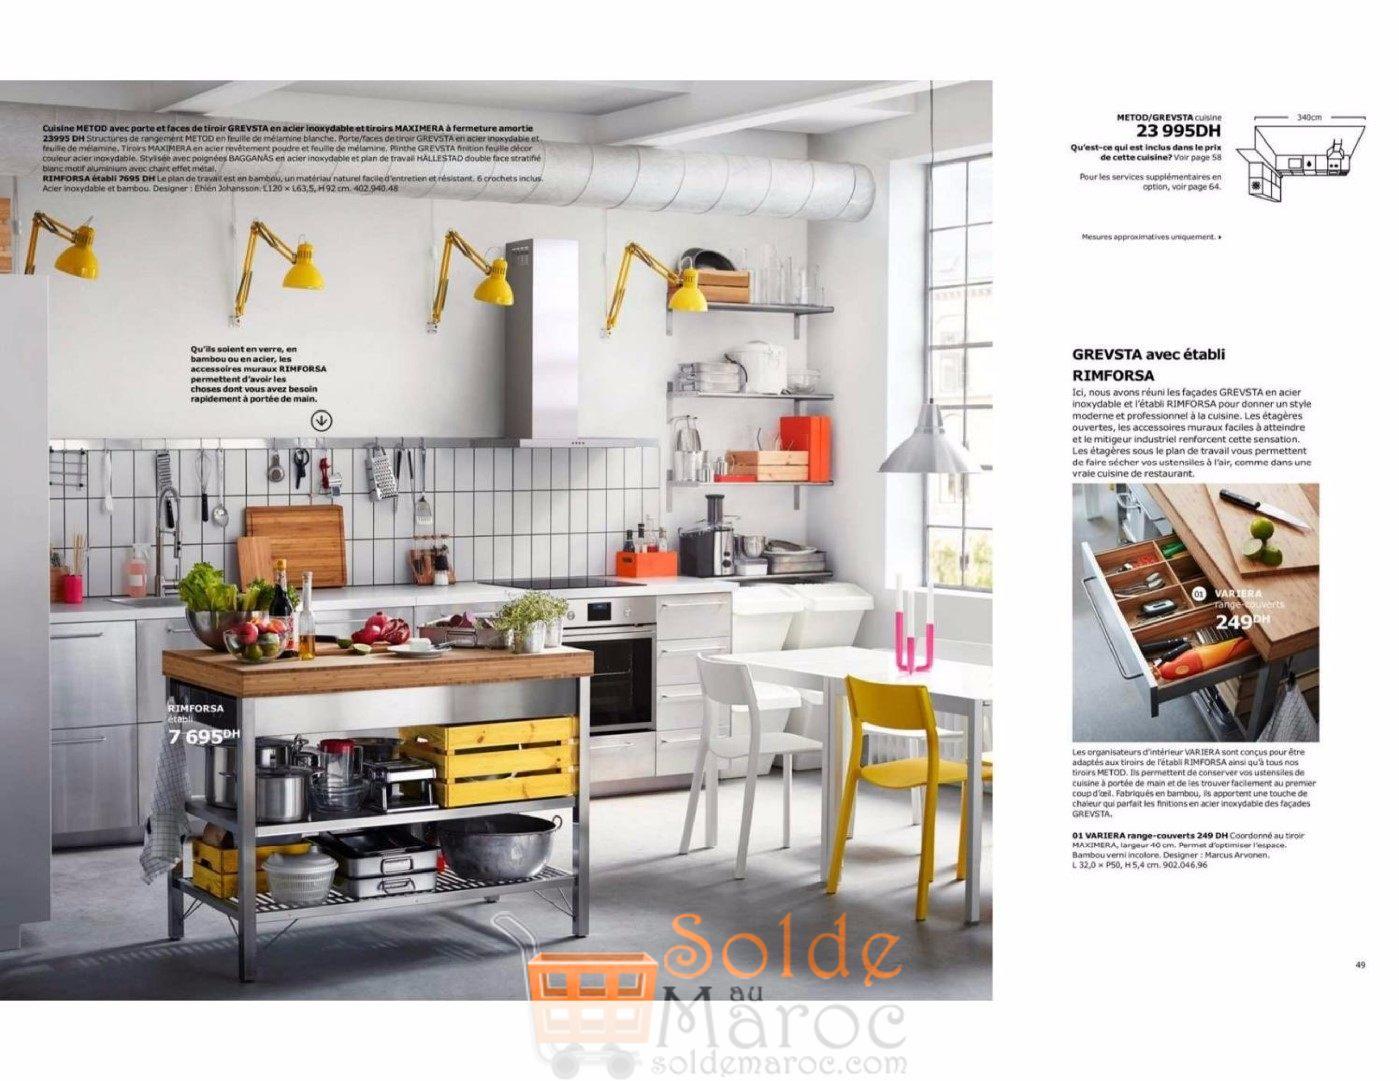 accessoires cuisine ikea maroc. Black Bedroom Furniture Sets. Home Design Ideas